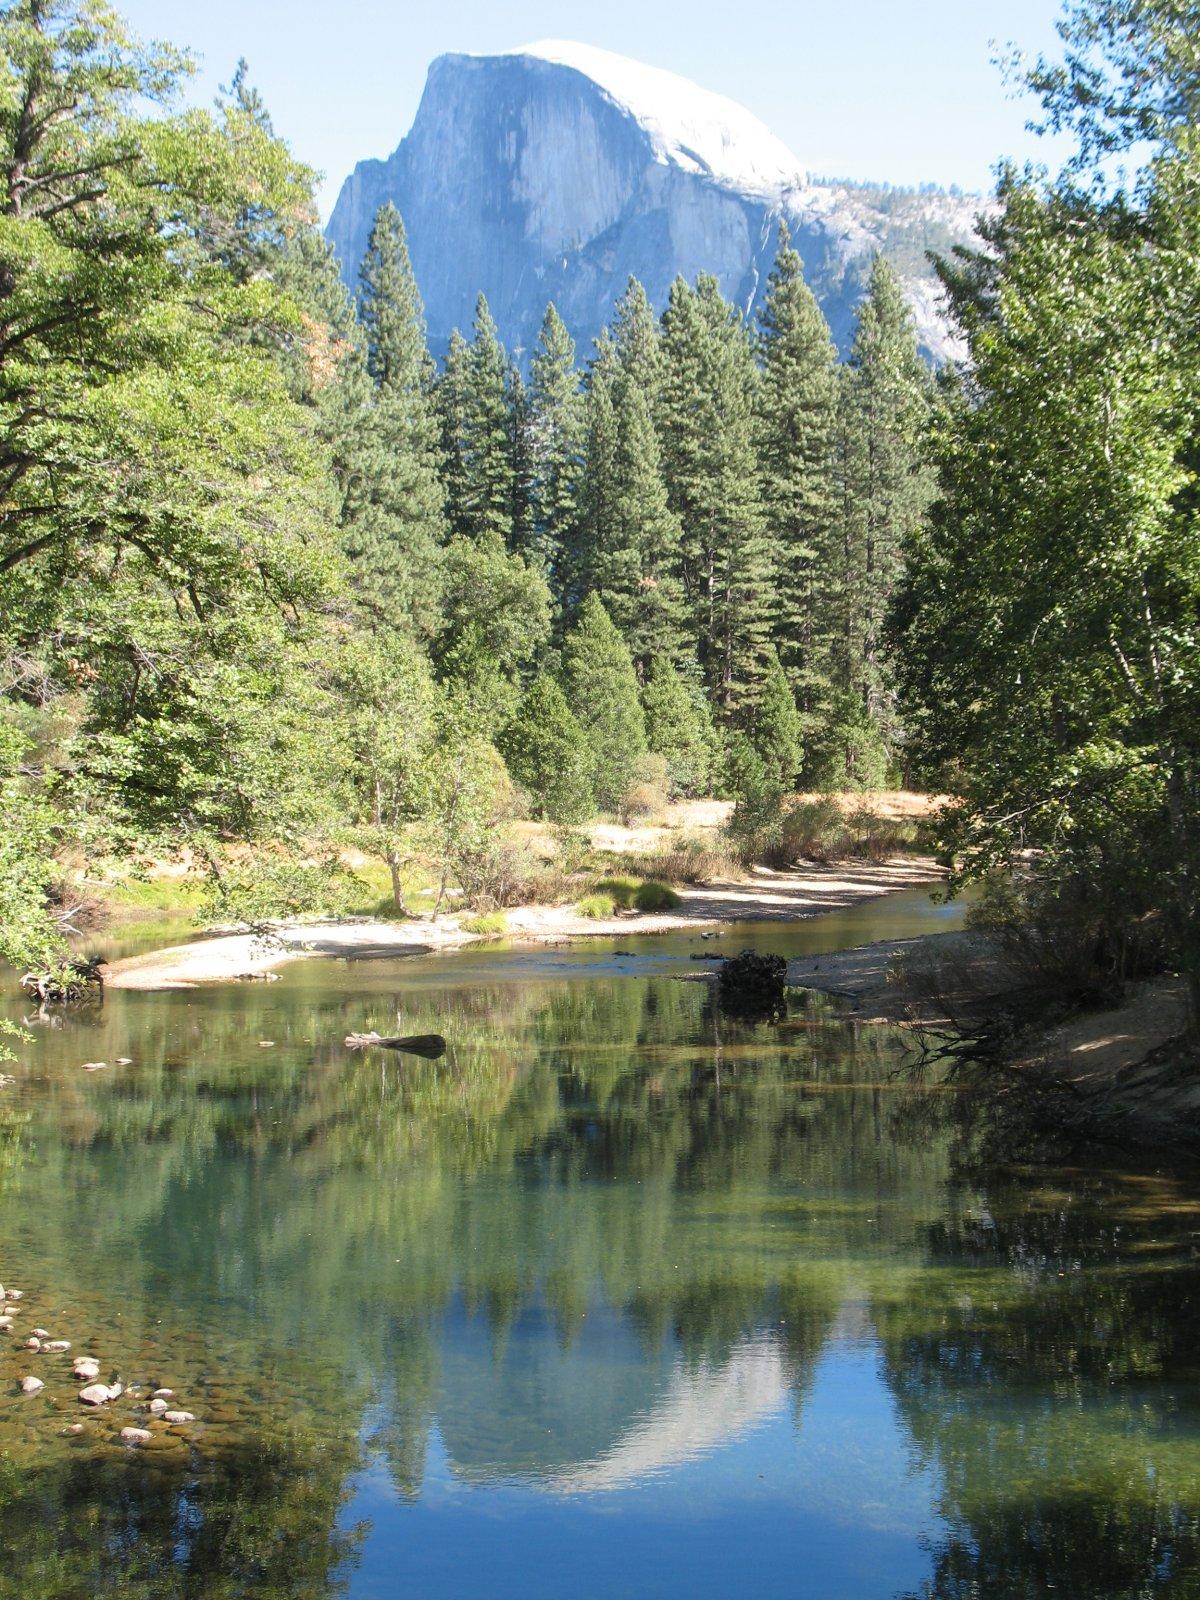 Click image for larger version  Name:Yosemite October 2012 051.jpg Views:75 Size:554.1 KB ID:171090